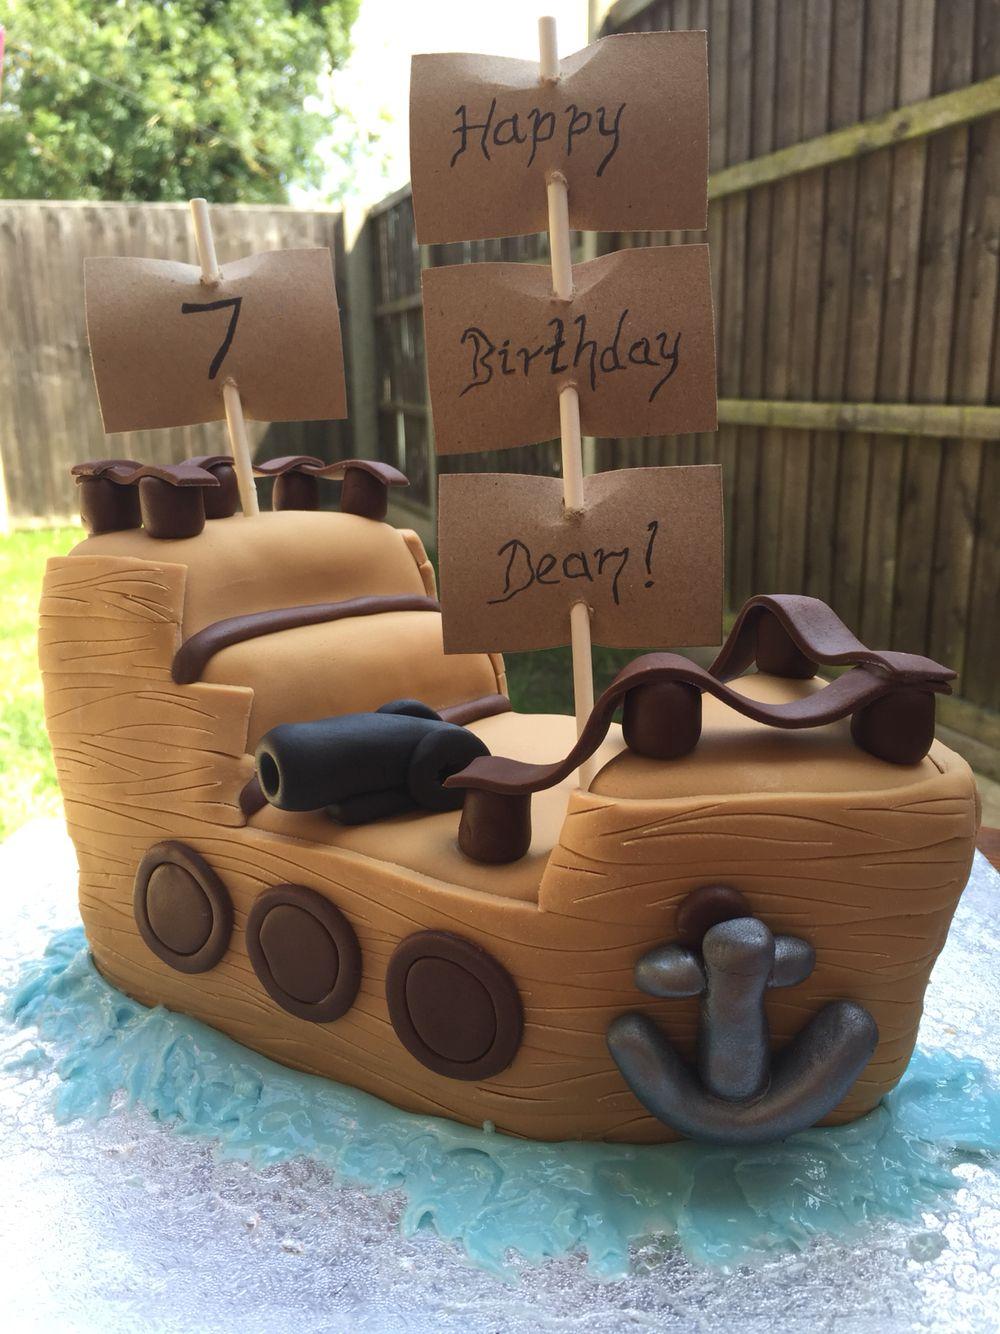 Pirate ship birthday cake Pirate Ships Pinterest Pirate ships